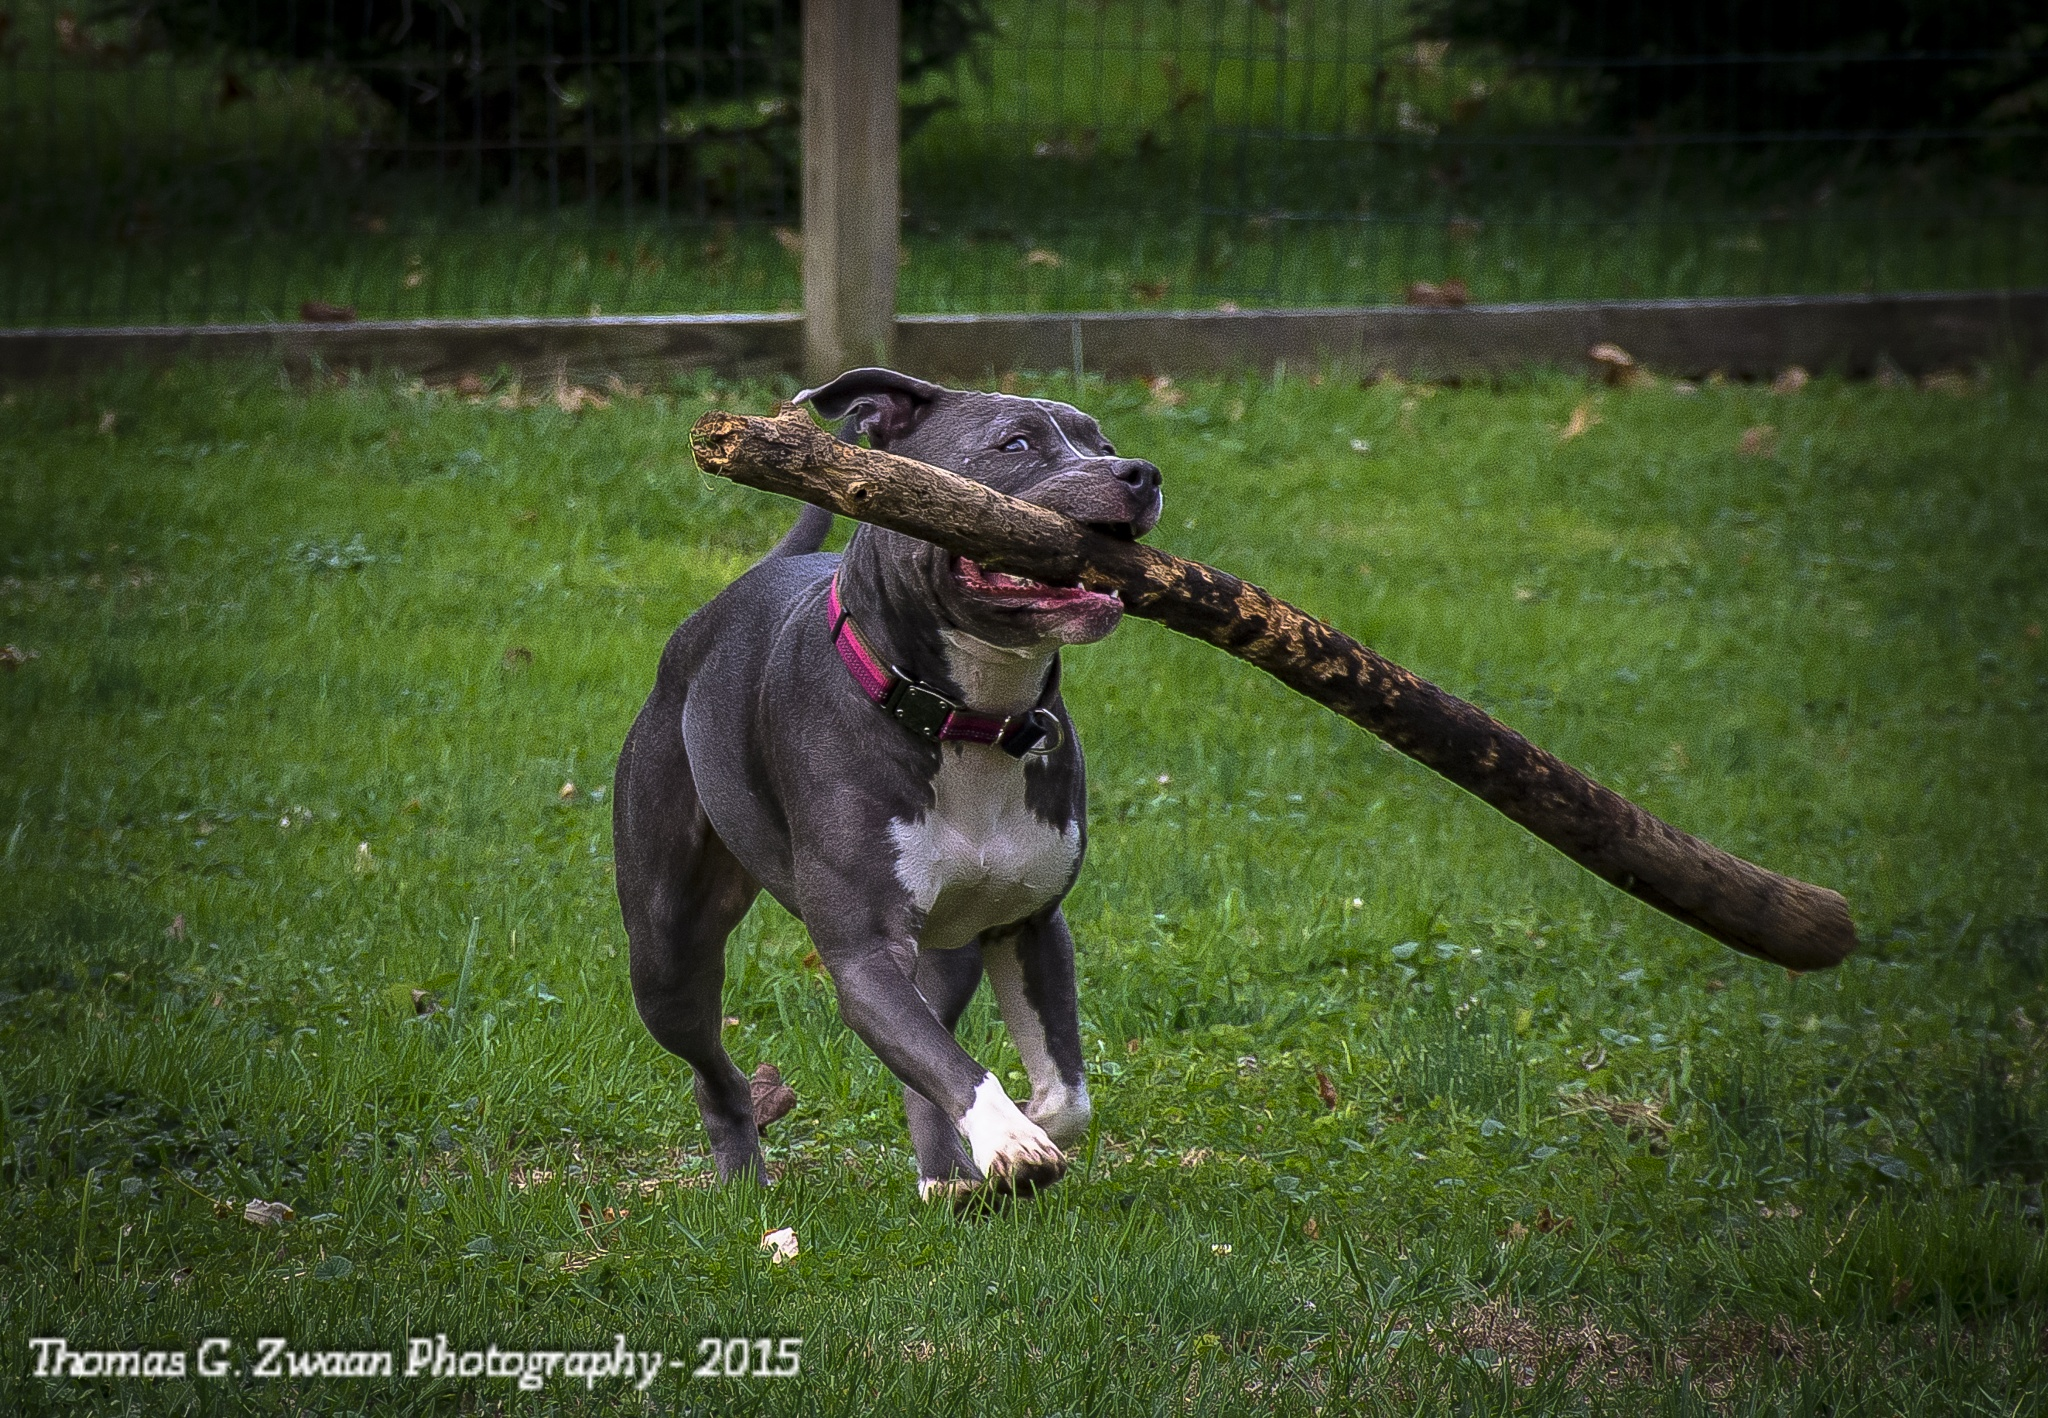 Playing Stick by thomasgzwaanPhotography